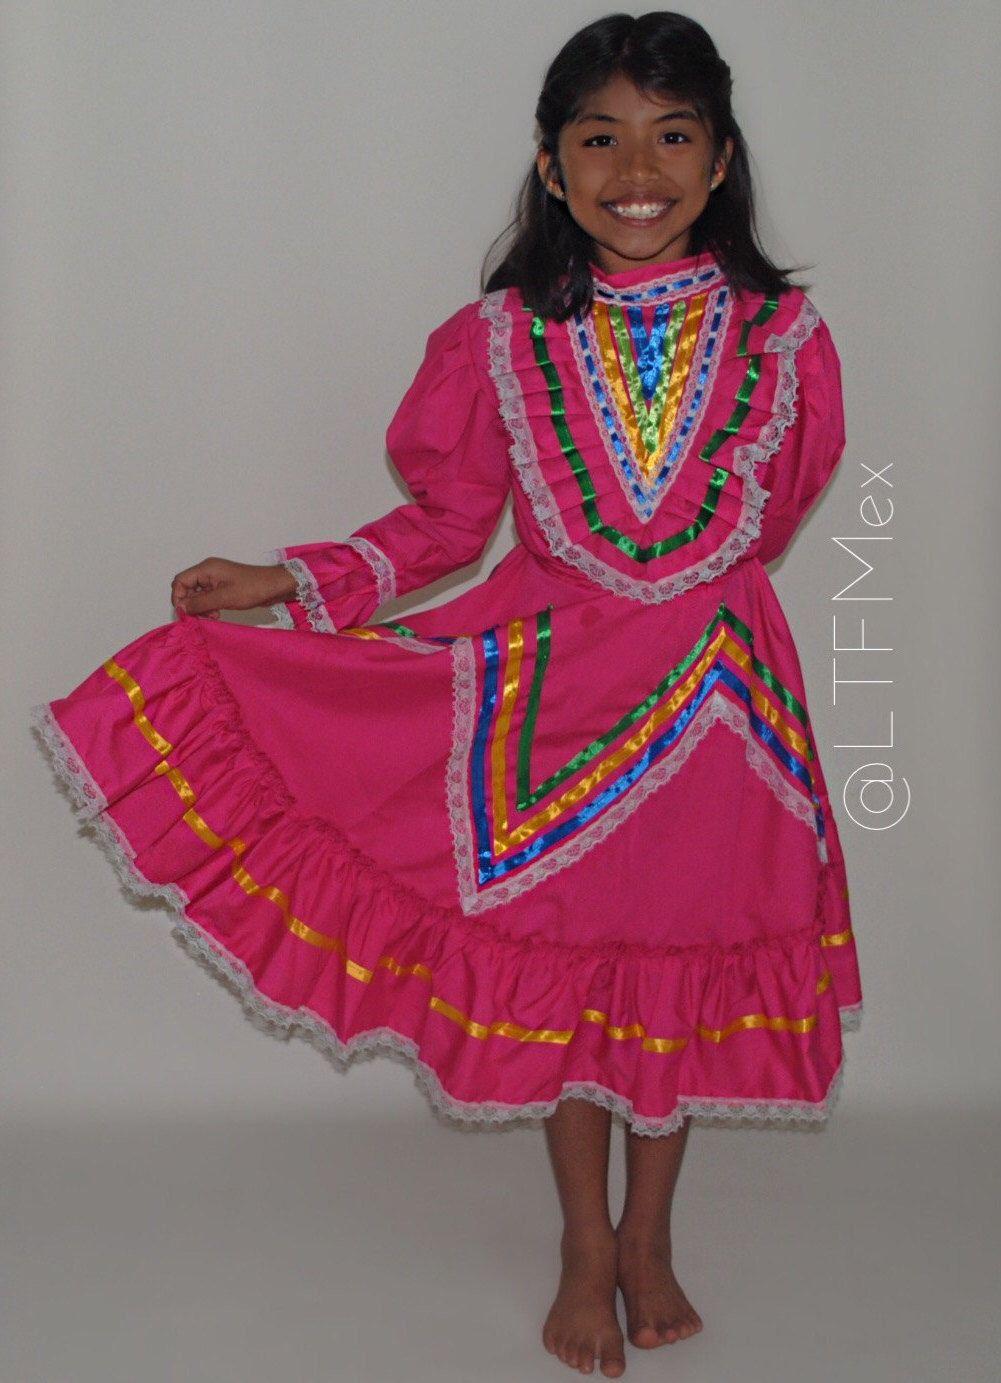 Blue Jalisco Dress Pink Jalisco Dress Vestido De Jalisco